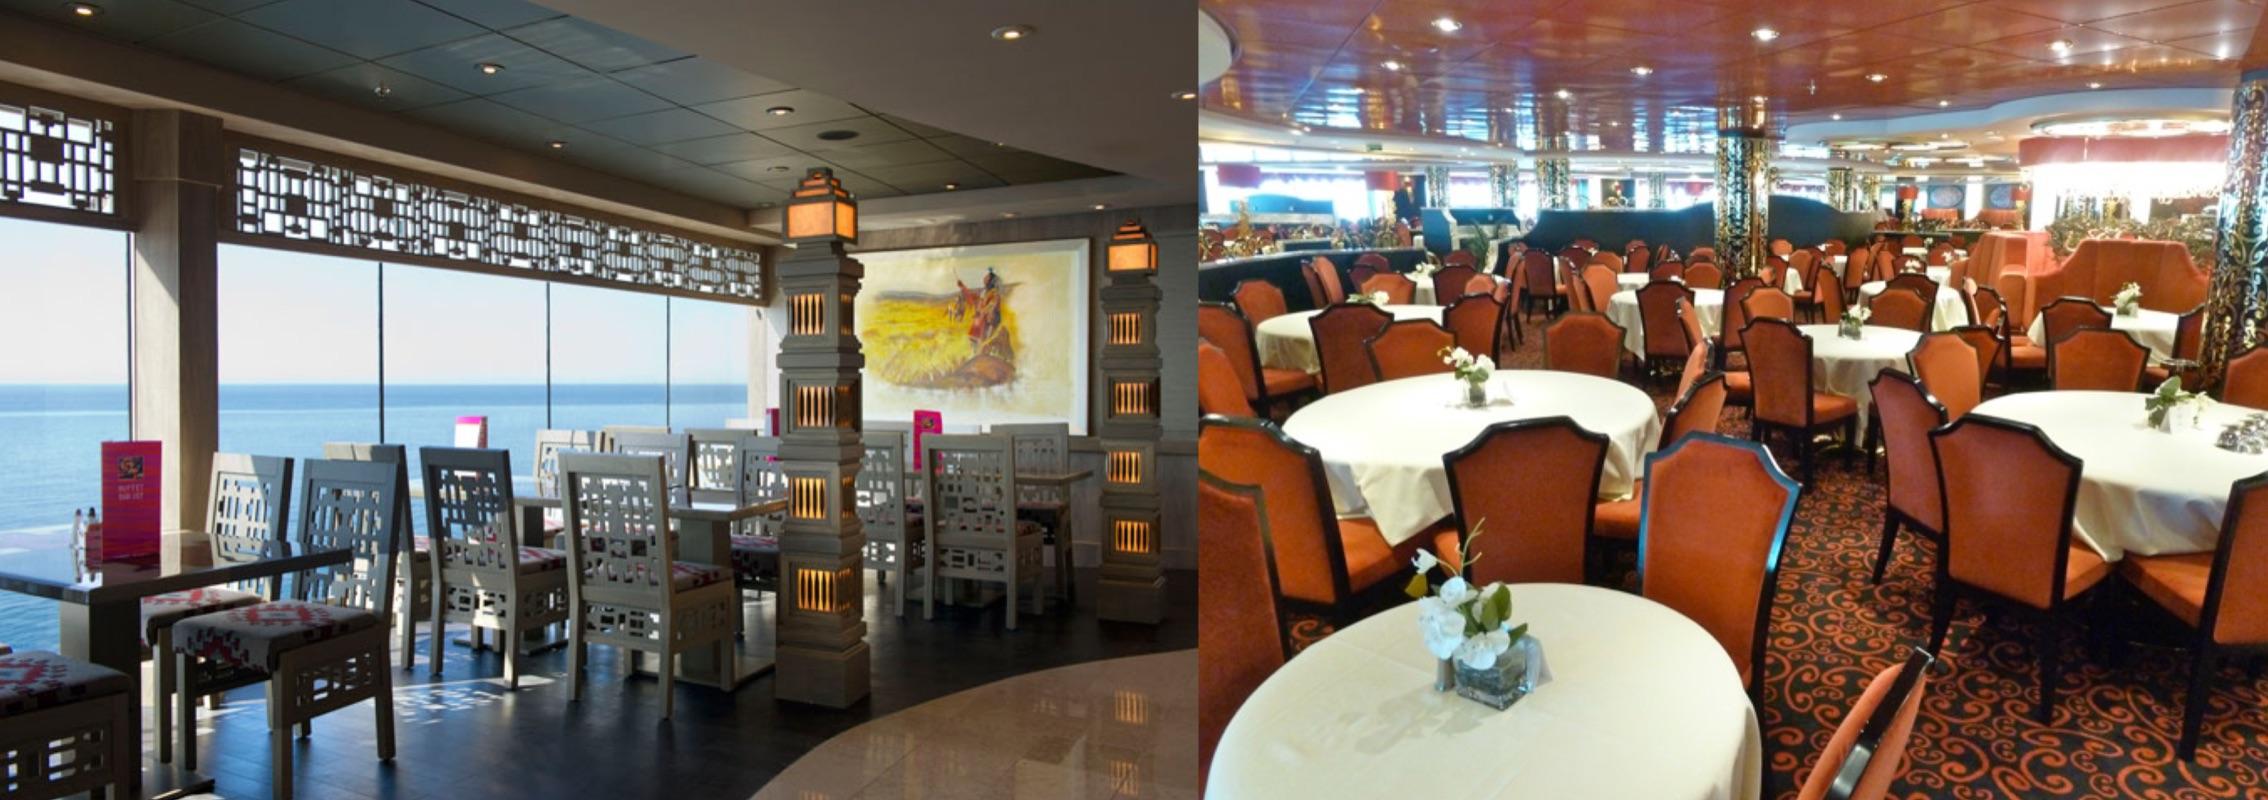 Restaurants MSC Divina